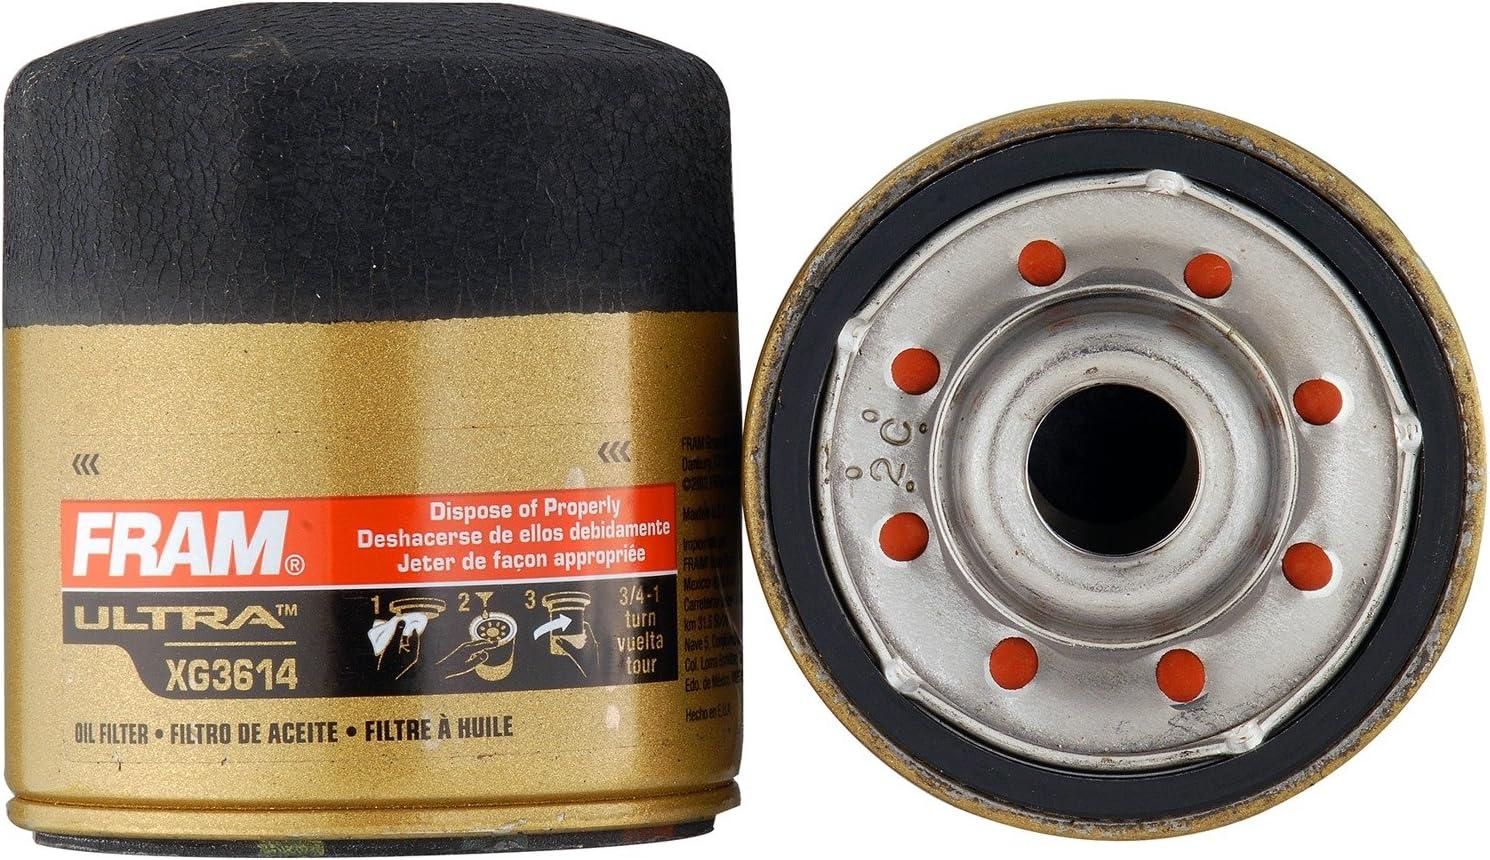 FRAM XG3614 Ultra Synthetic Spin-On Filter